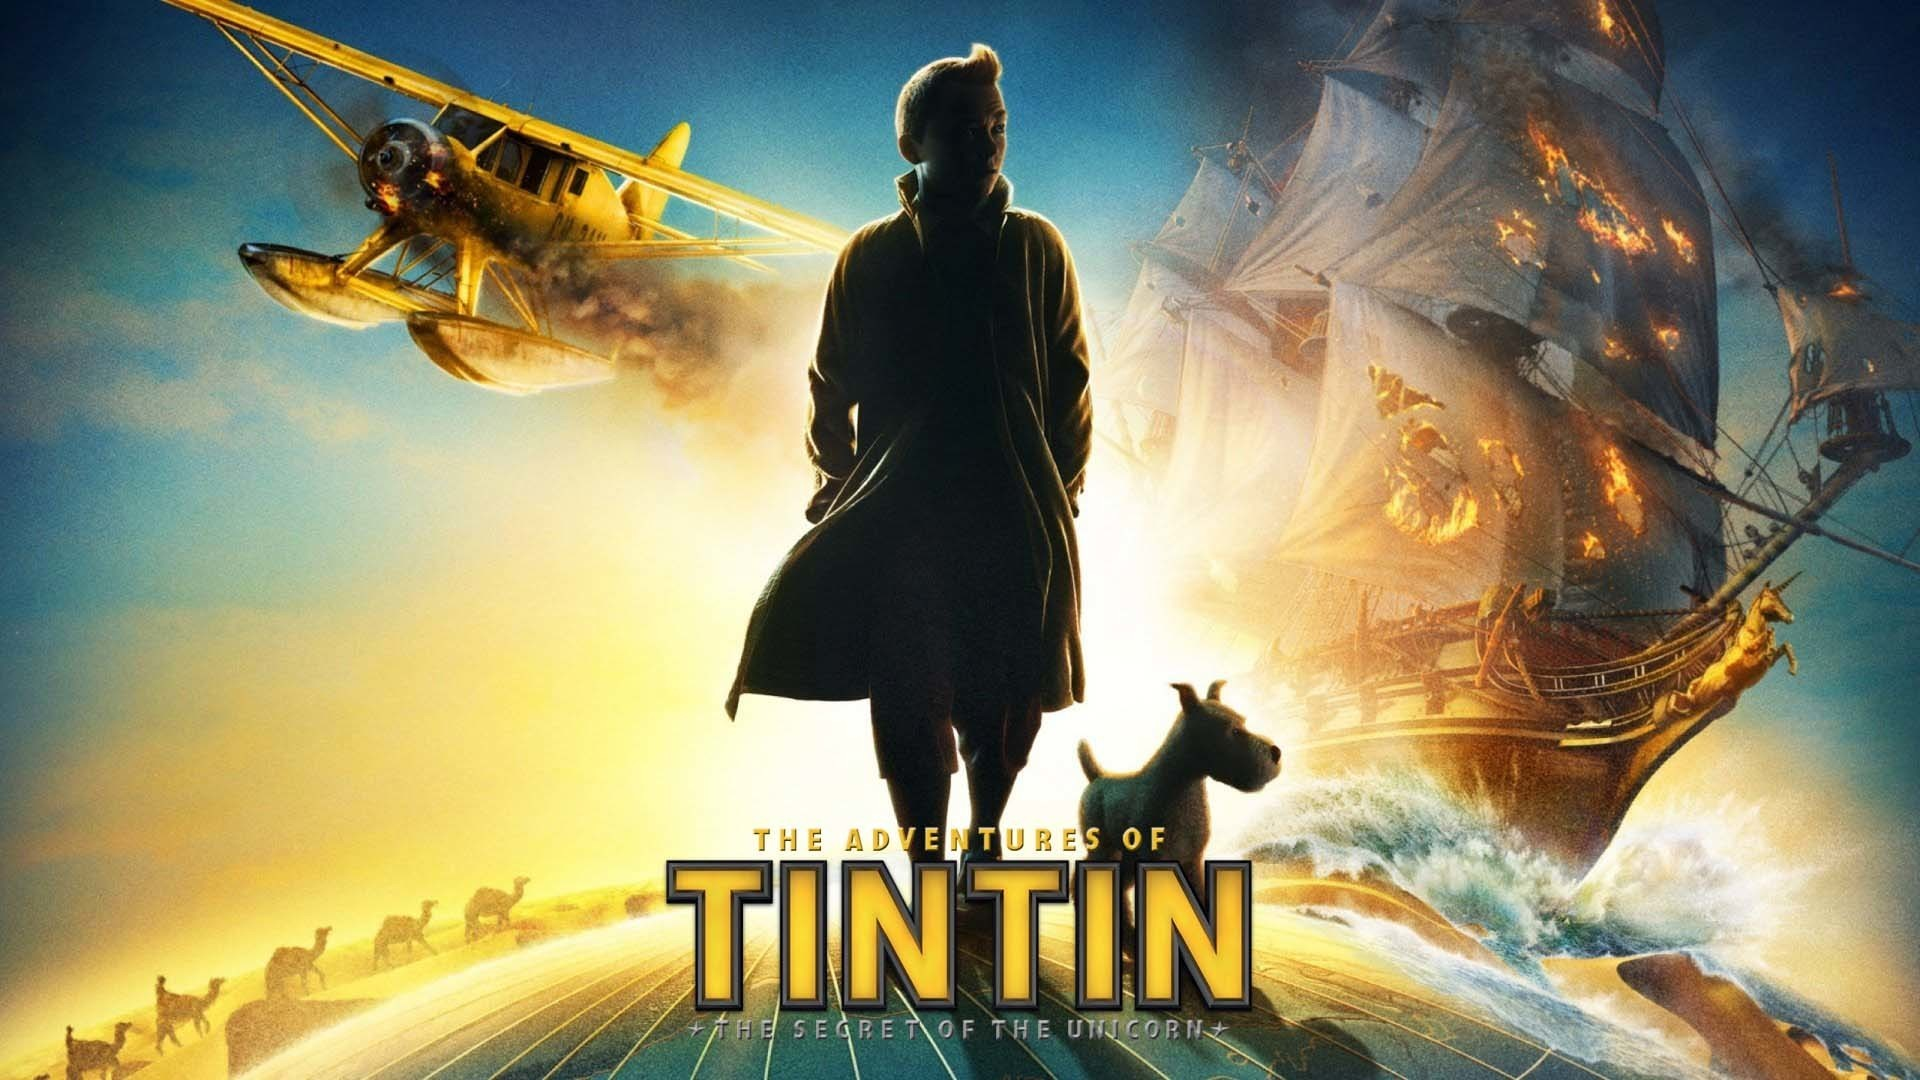 Приключения Тинтина: Тайна единорога смотреть фото